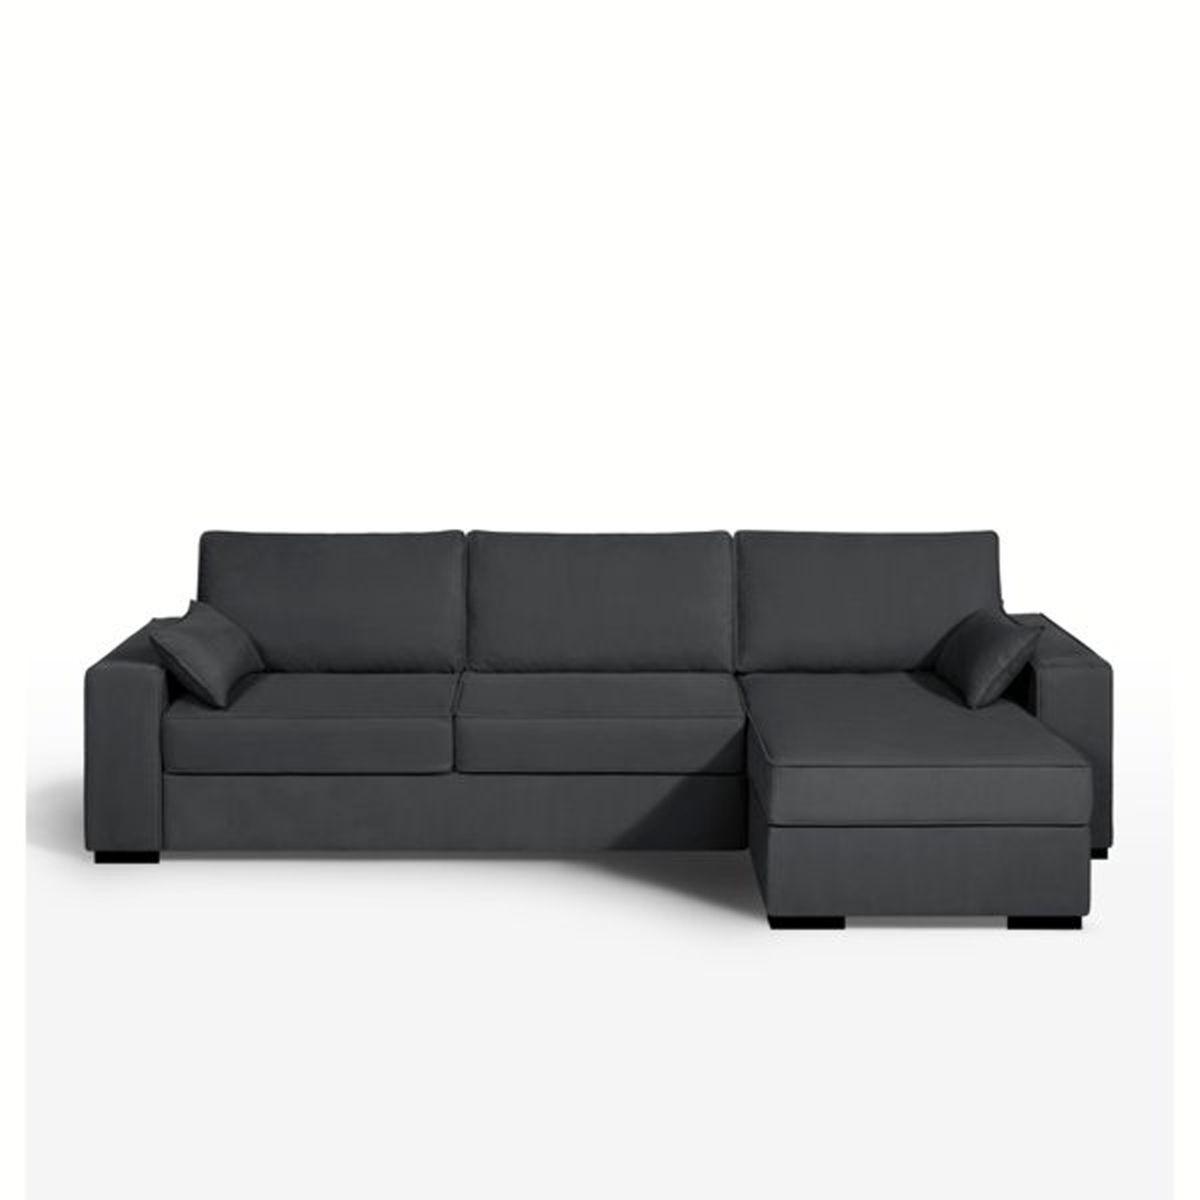 la redoute meuble d angle fabulous la redoute meuble. Black Bedroom Furniture Sets. Home Design Ideas